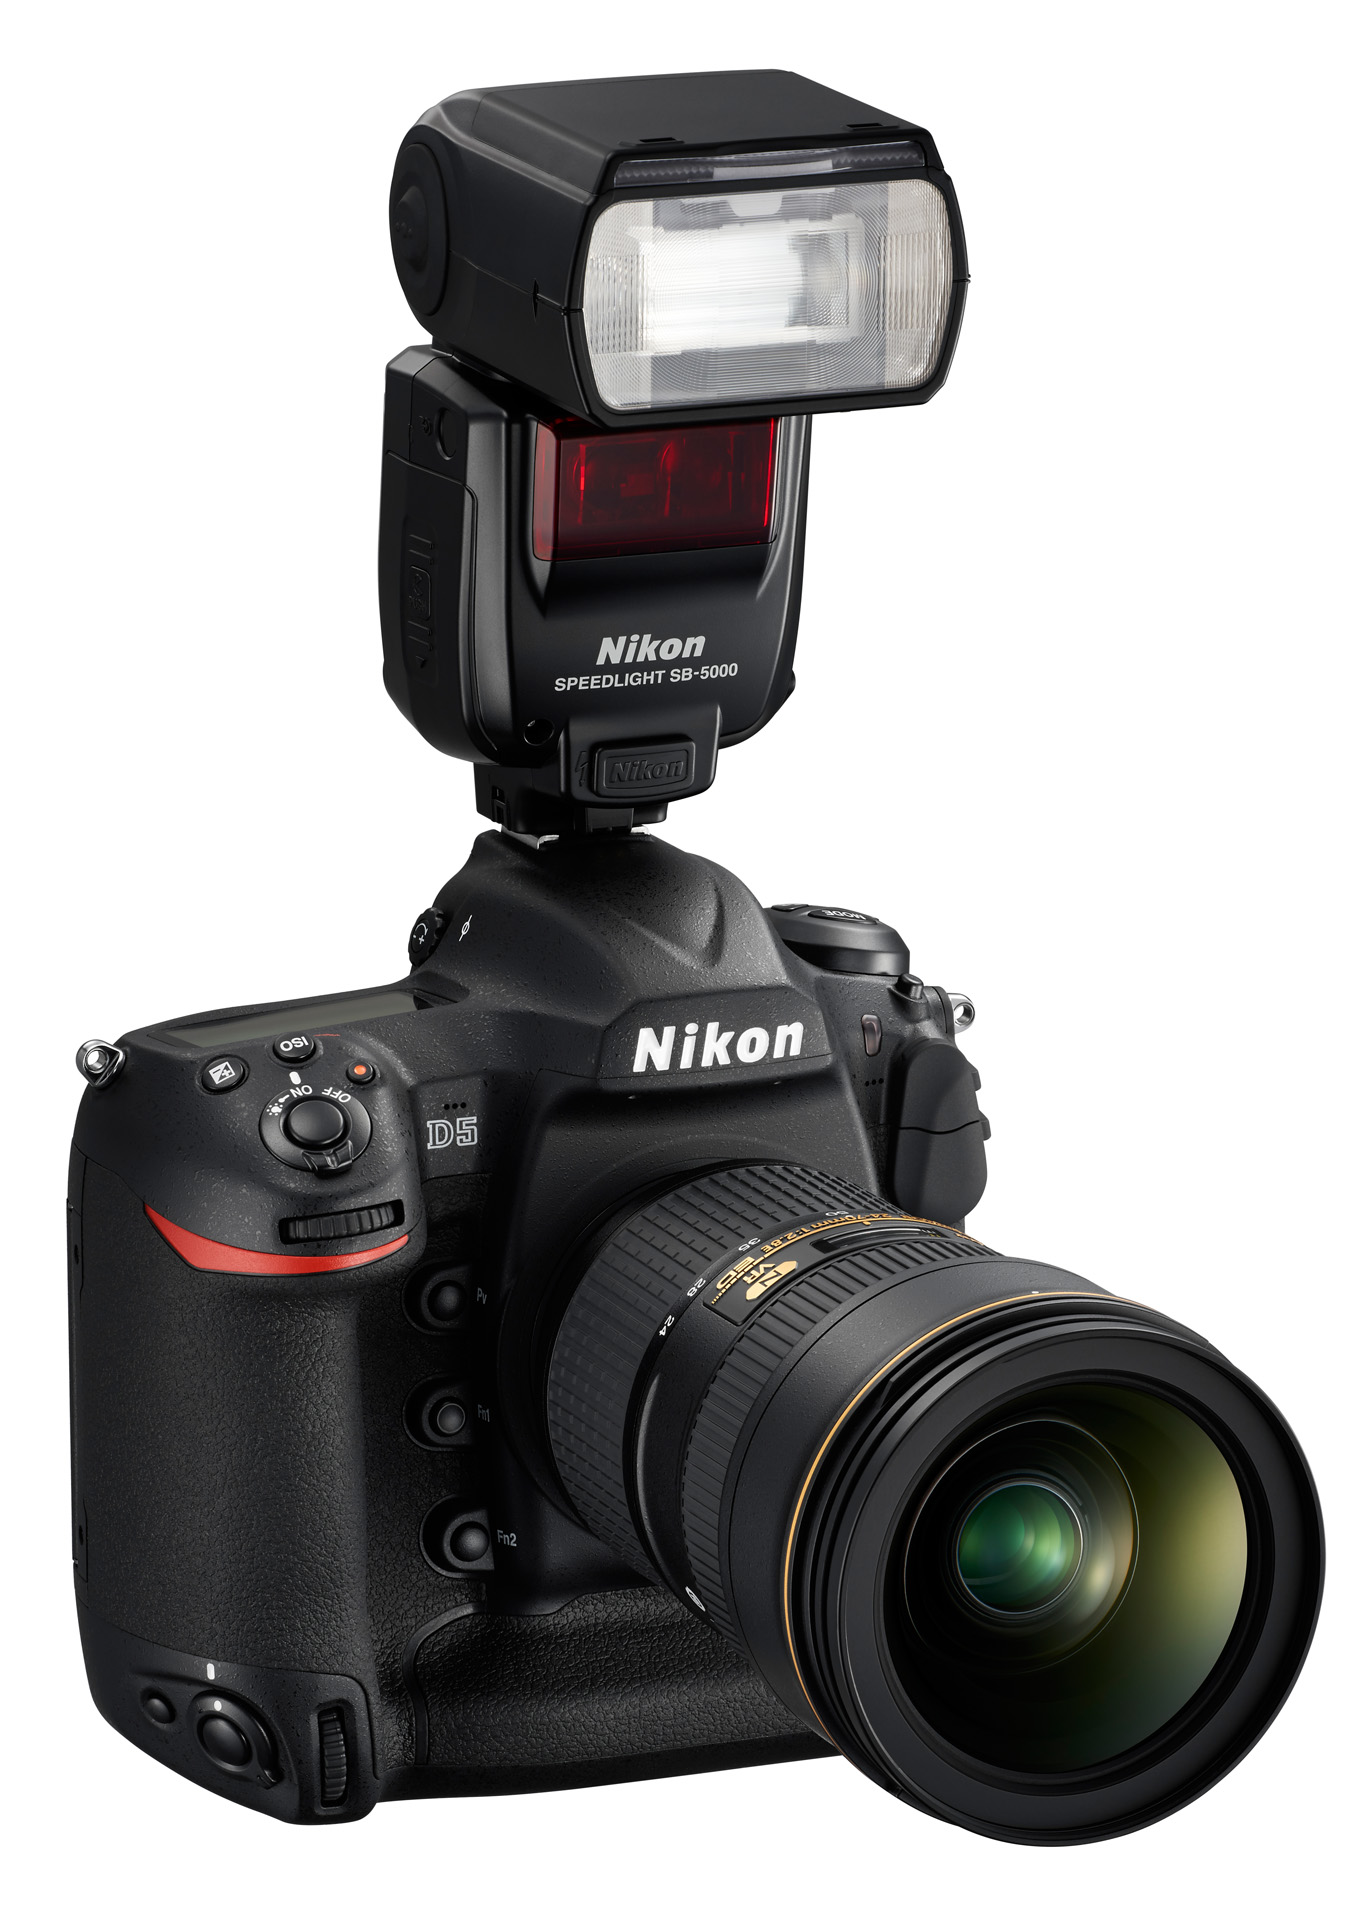 Nikon Speedlight SB-5000 na těle Nikonu D5